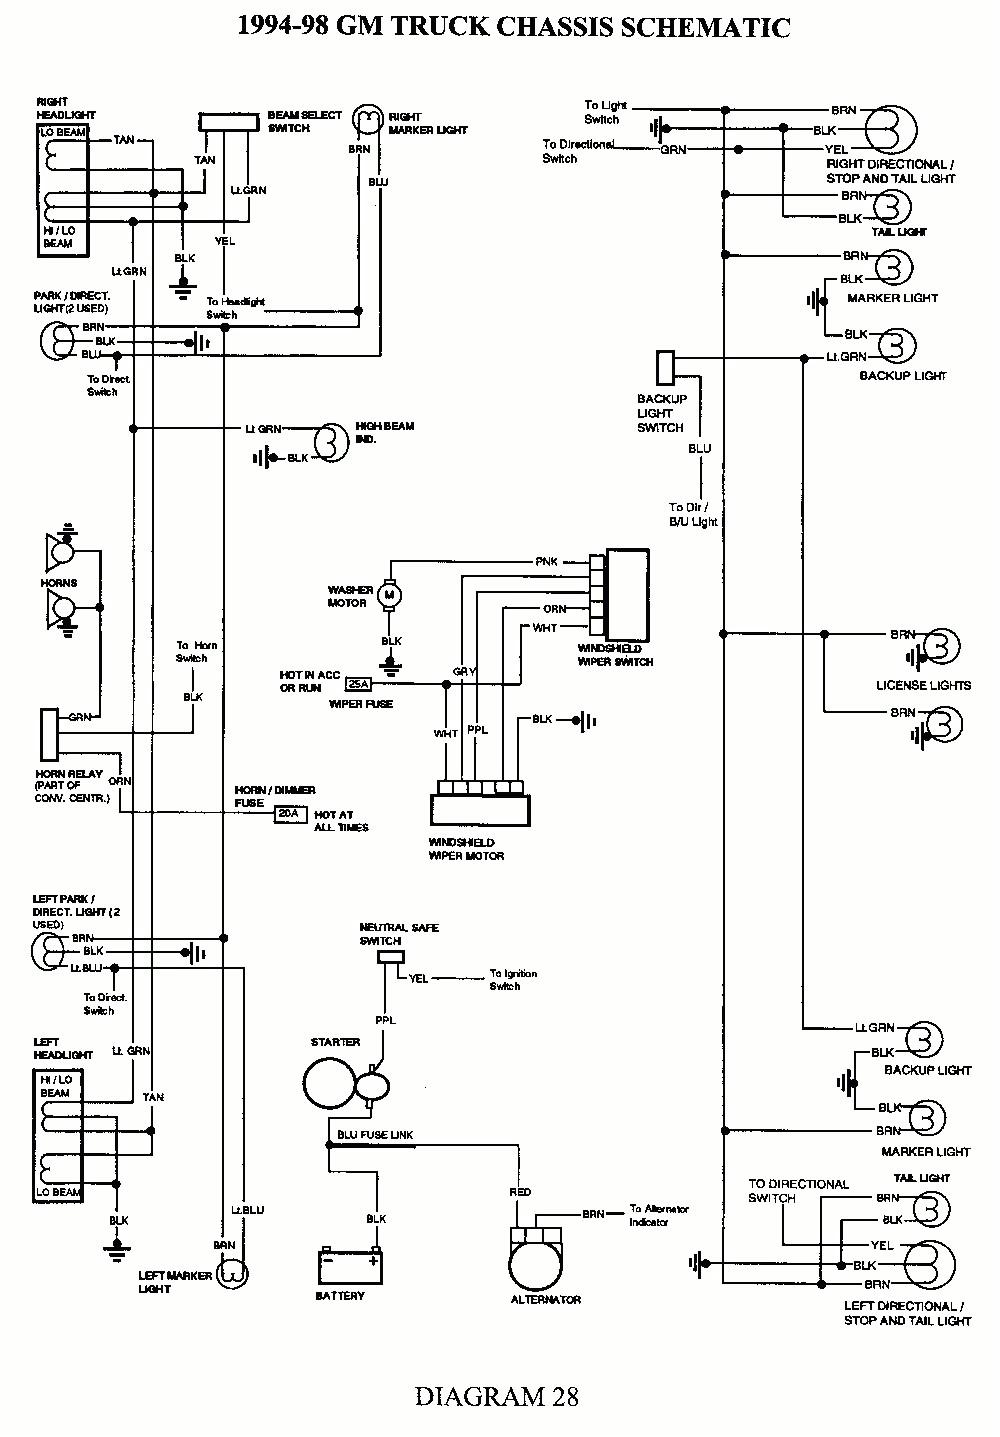 98 chevy 2500 headlight switch wiring wiring diagram blog 2500 98 chevy headlight switch wiring